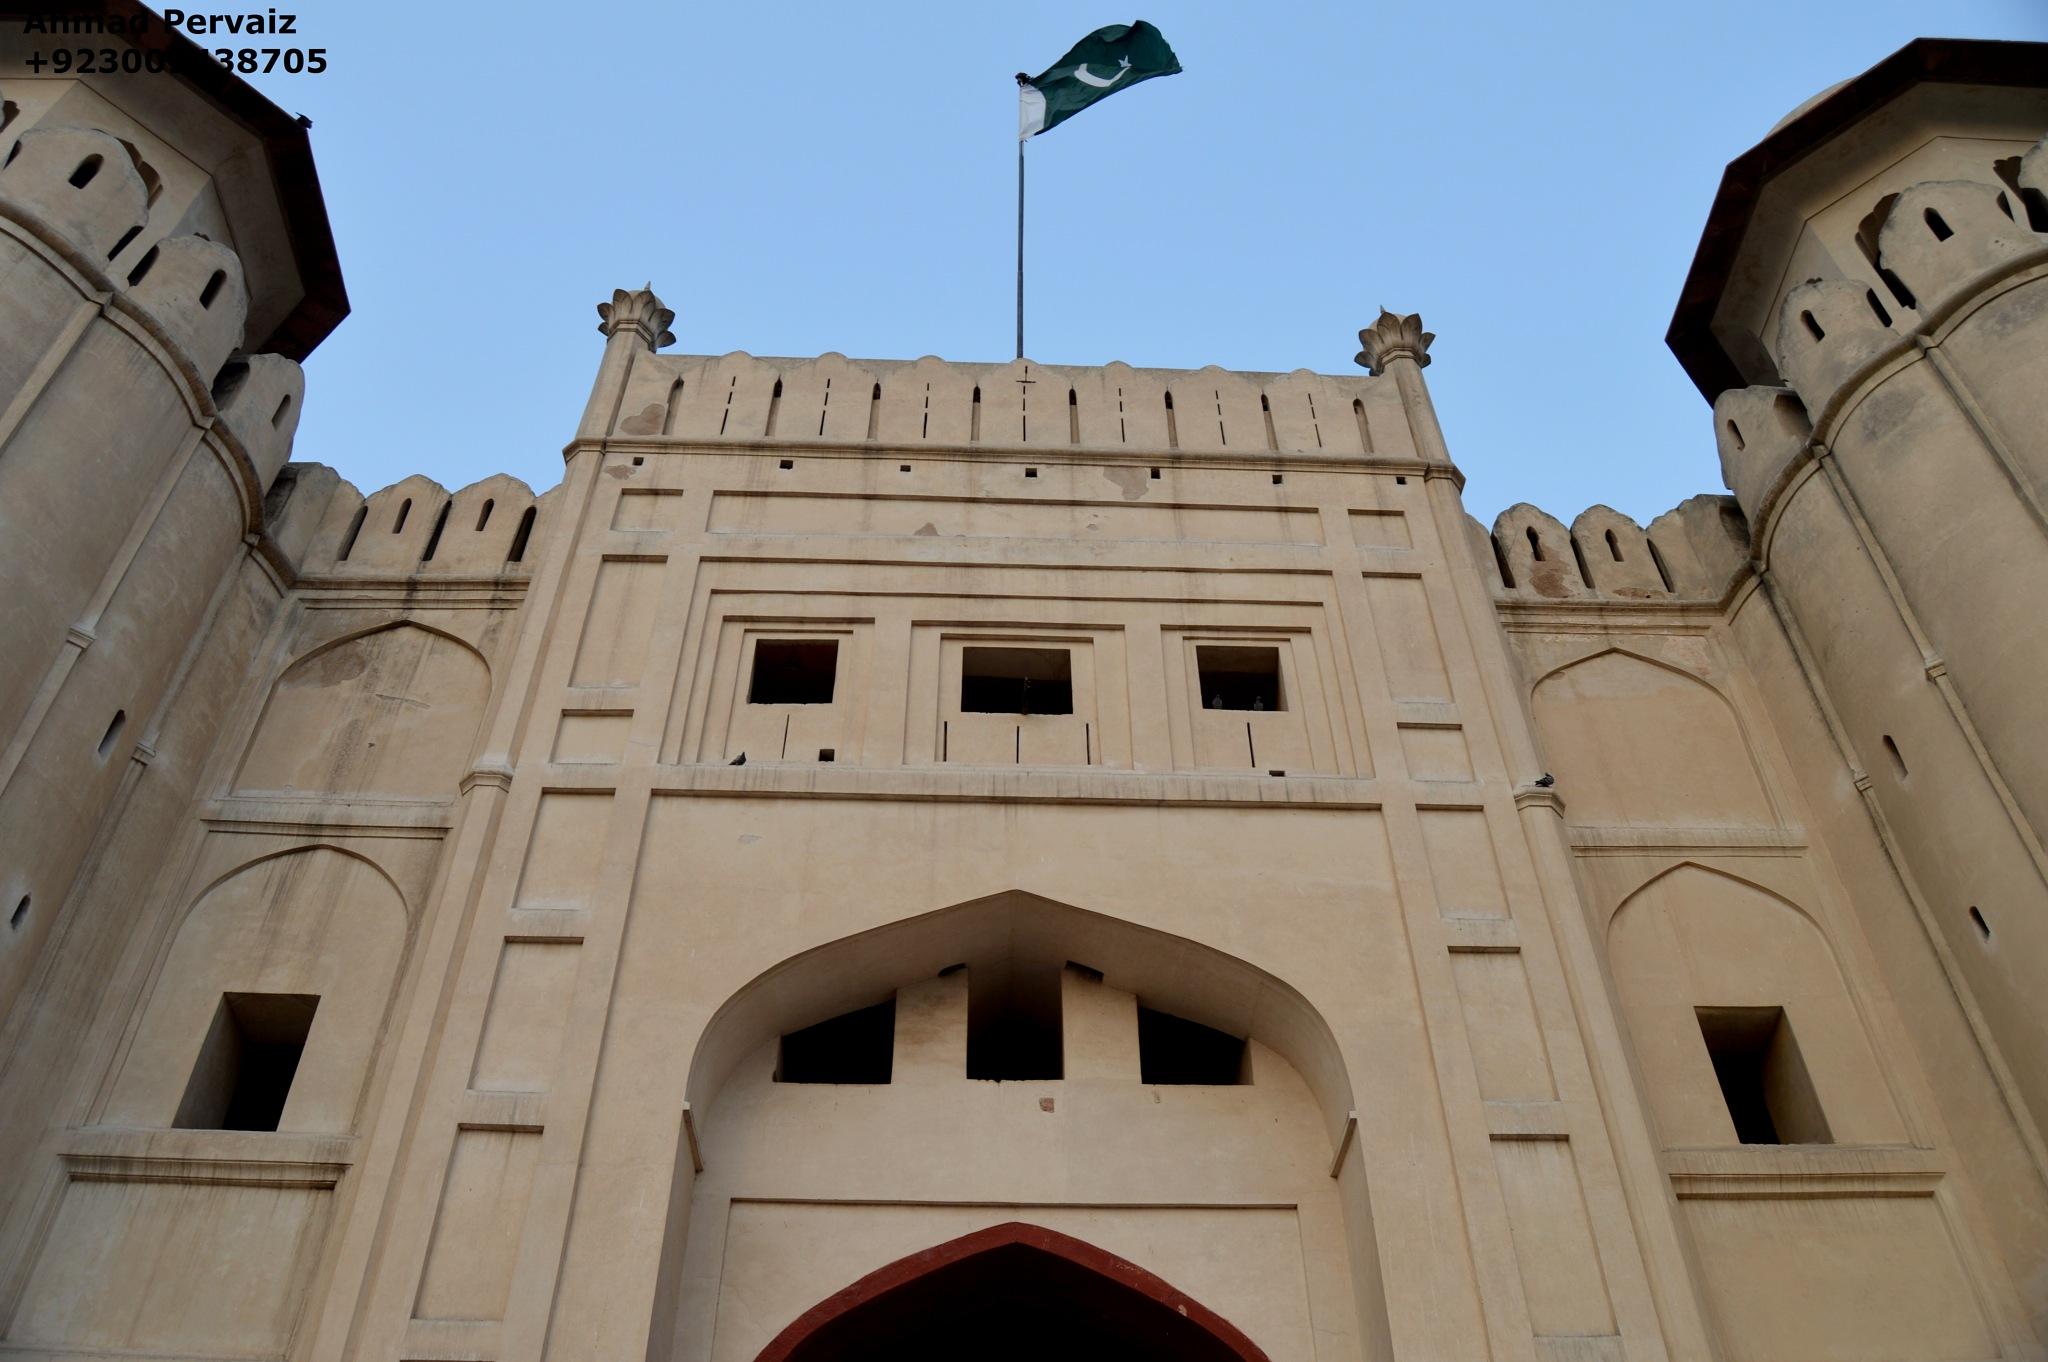 Lahore Fort Series by pervaiz_jiu-jitsu